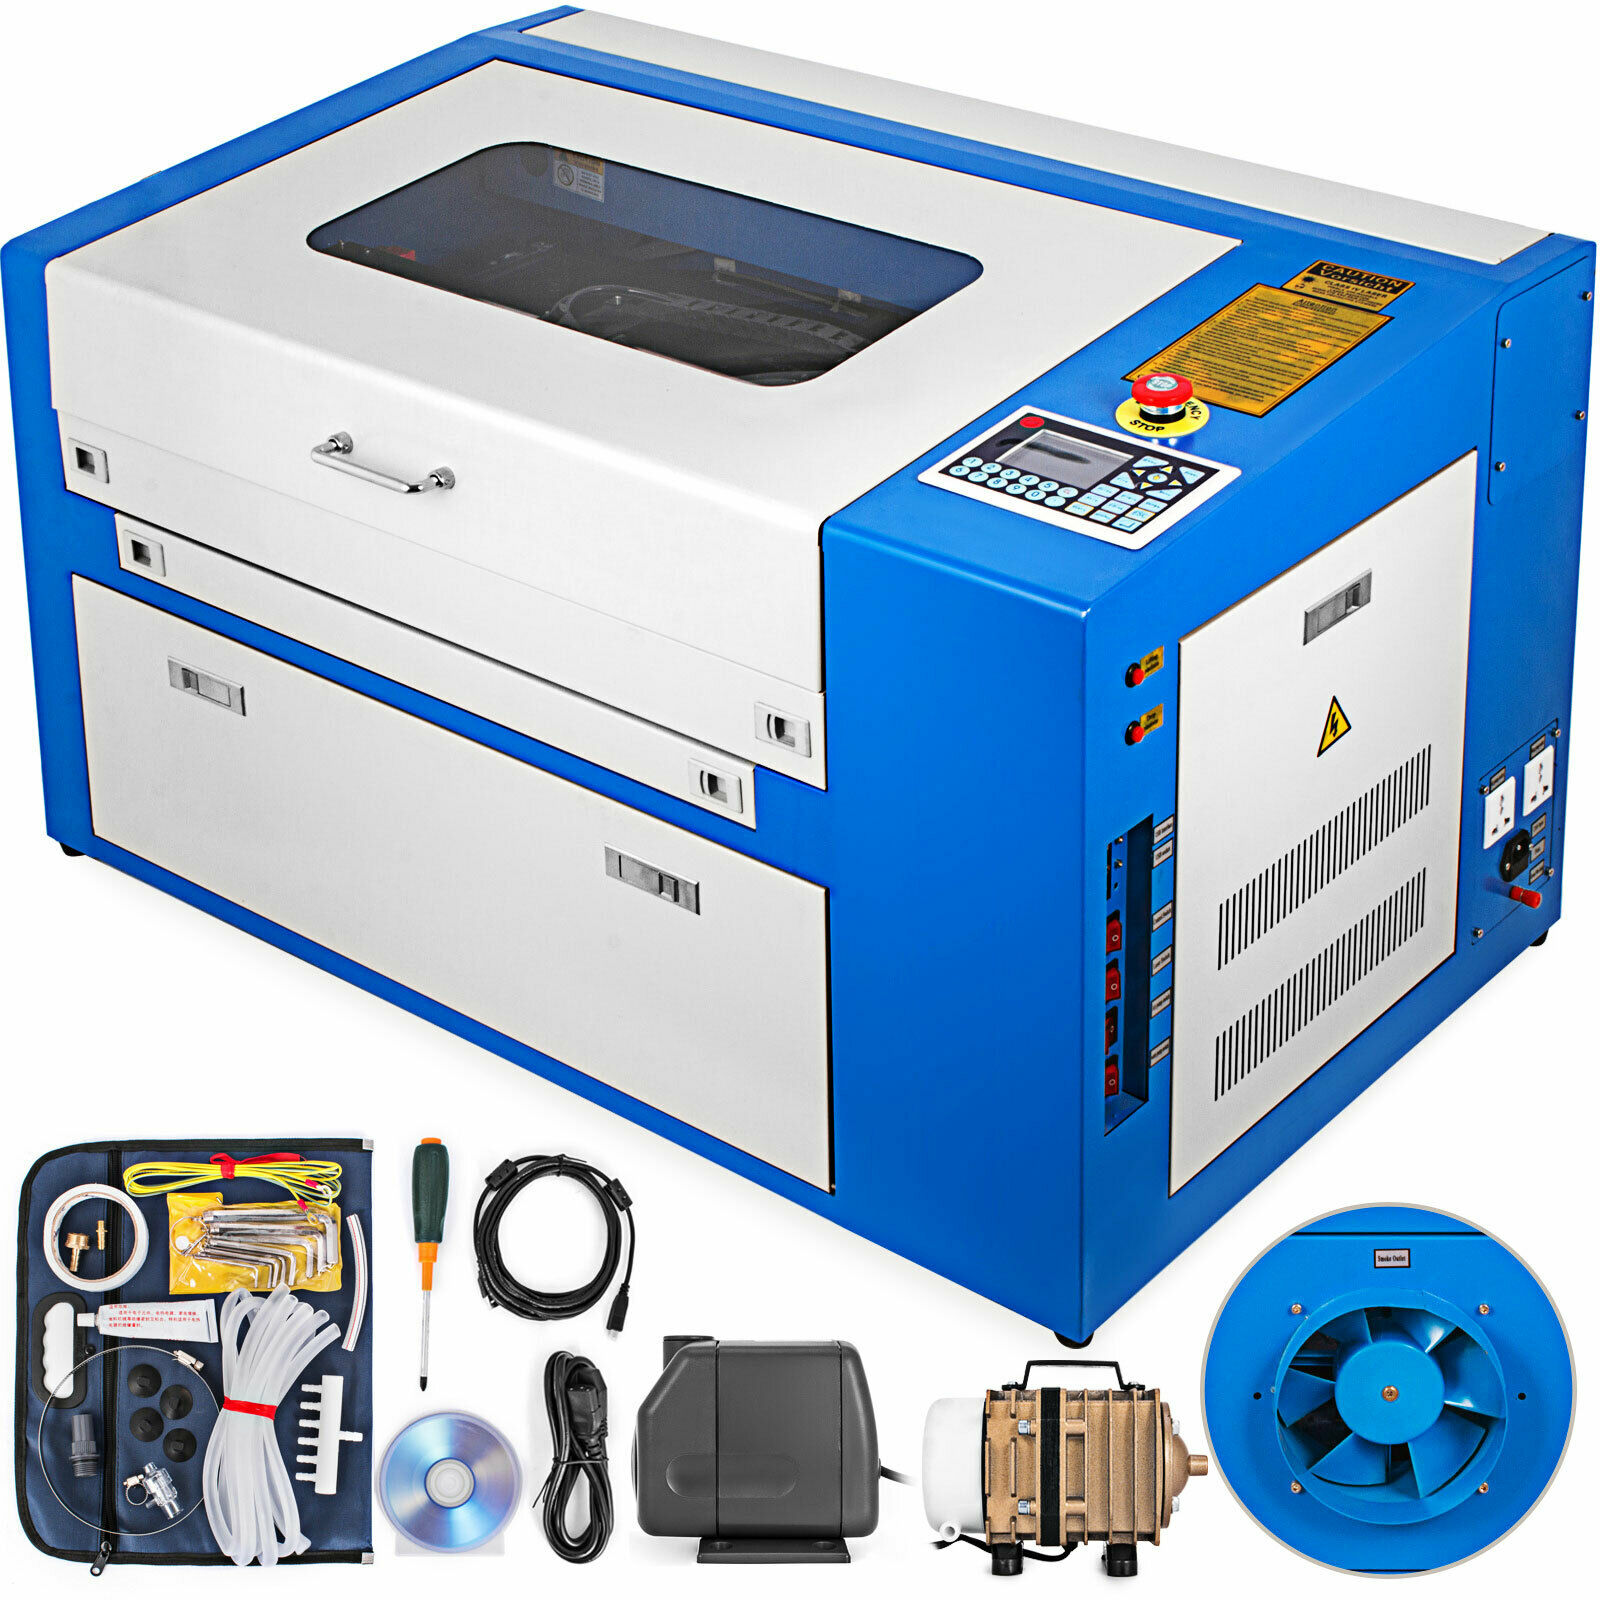 CO2 USB Laser 50W Engraving Cutting Machine 300x500mm Engraver Cutter Wood Working Machine